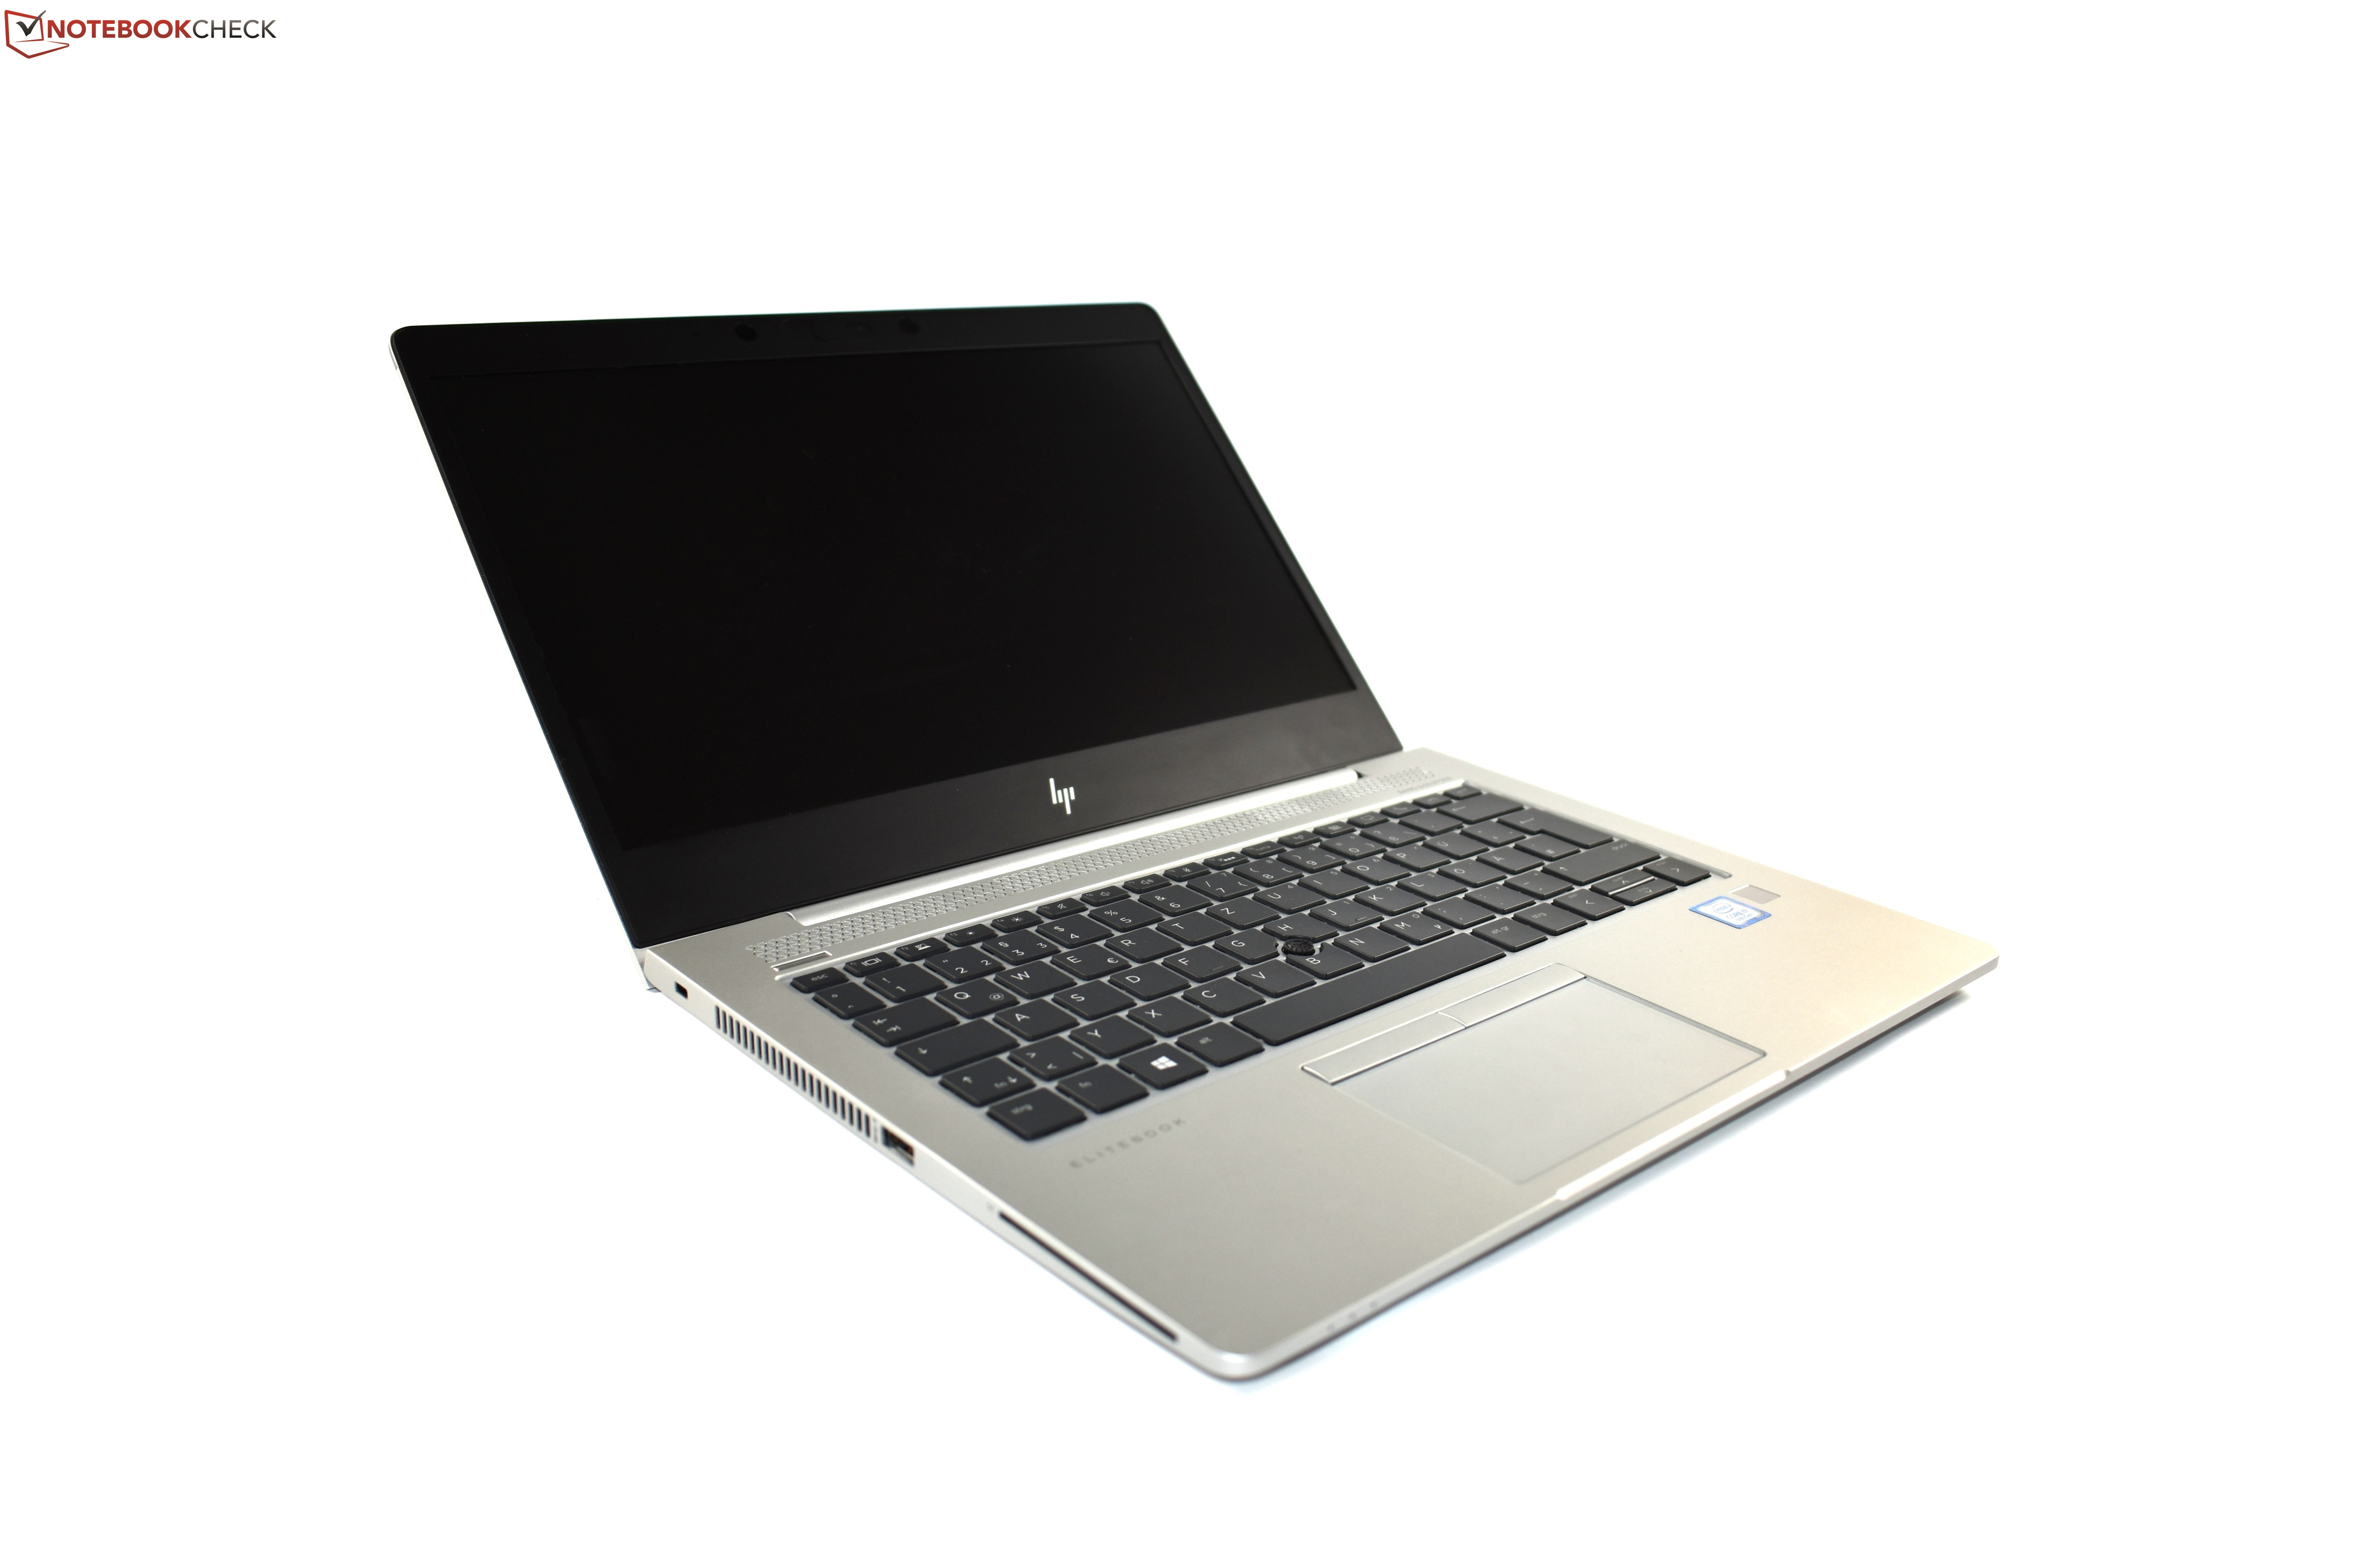 HP EliteBook 830 G5 (i7, FHD, SureView) Laptop Review